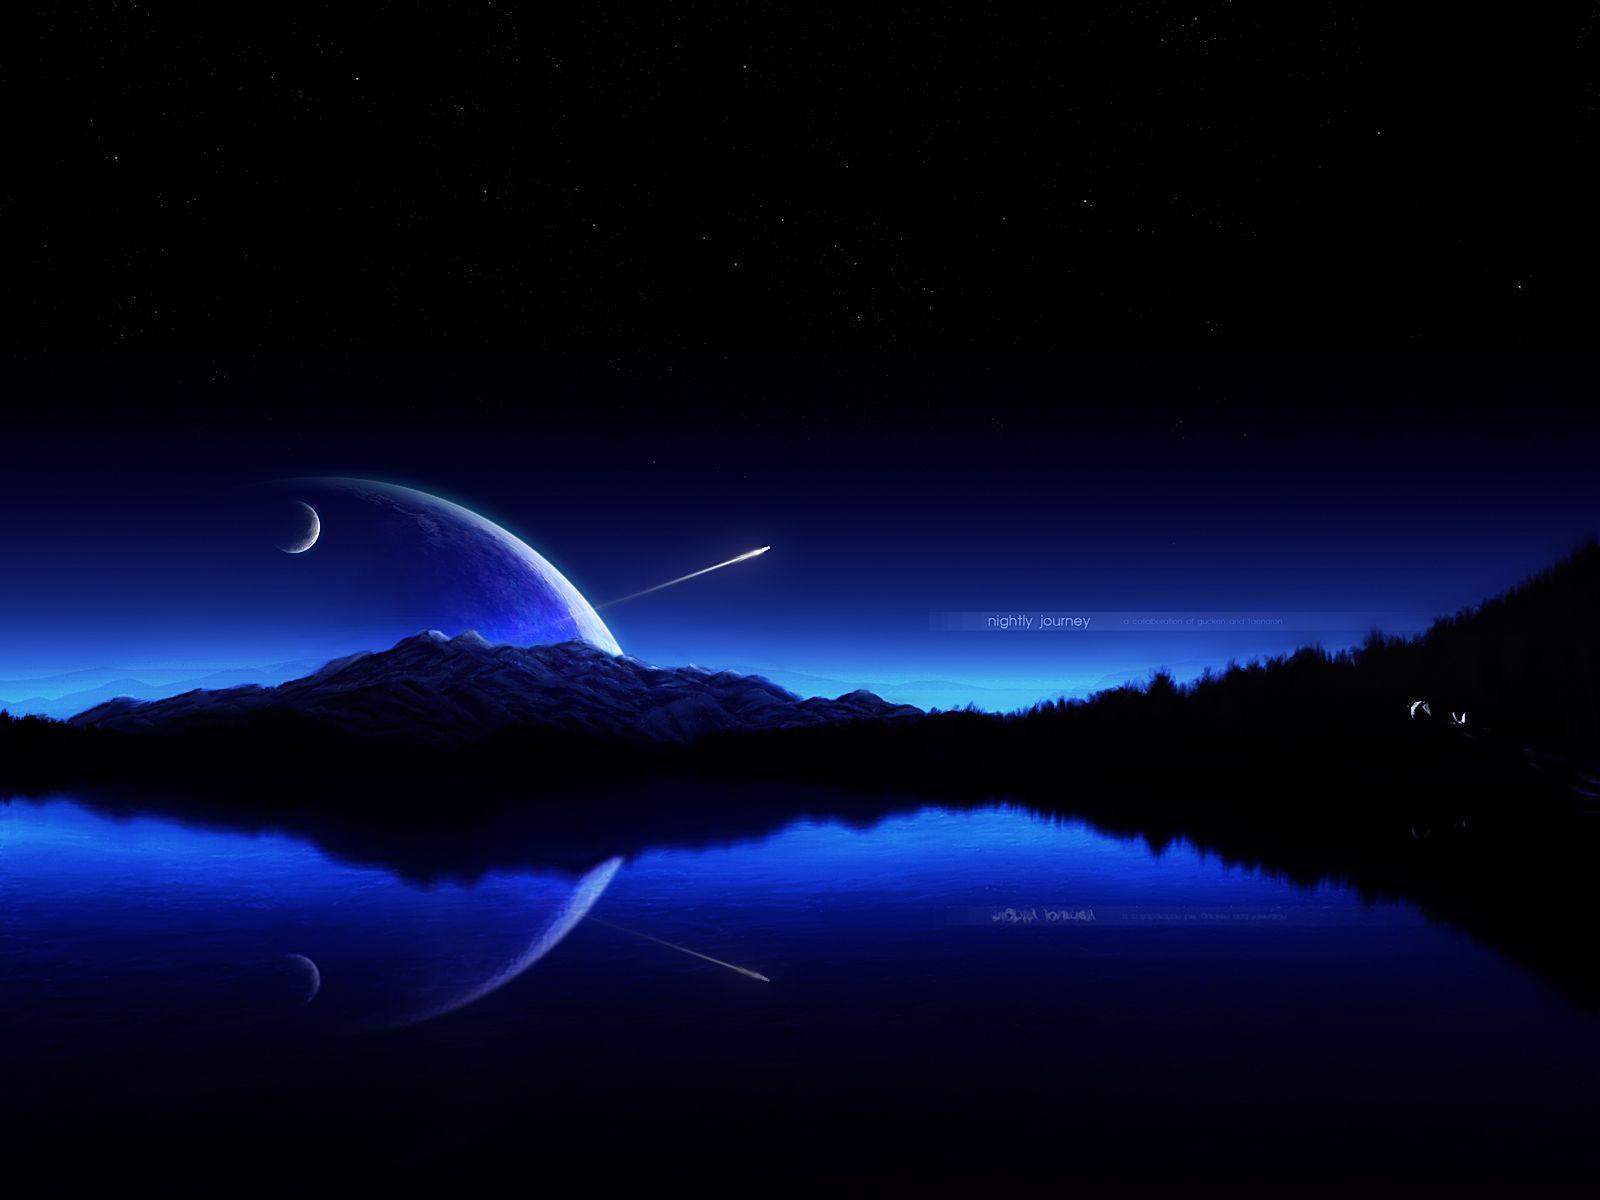 Beautiful Wallpaper Night Dragon - e5e6c831c072611cfe5b151fc71f25b2  Gallery.jpg